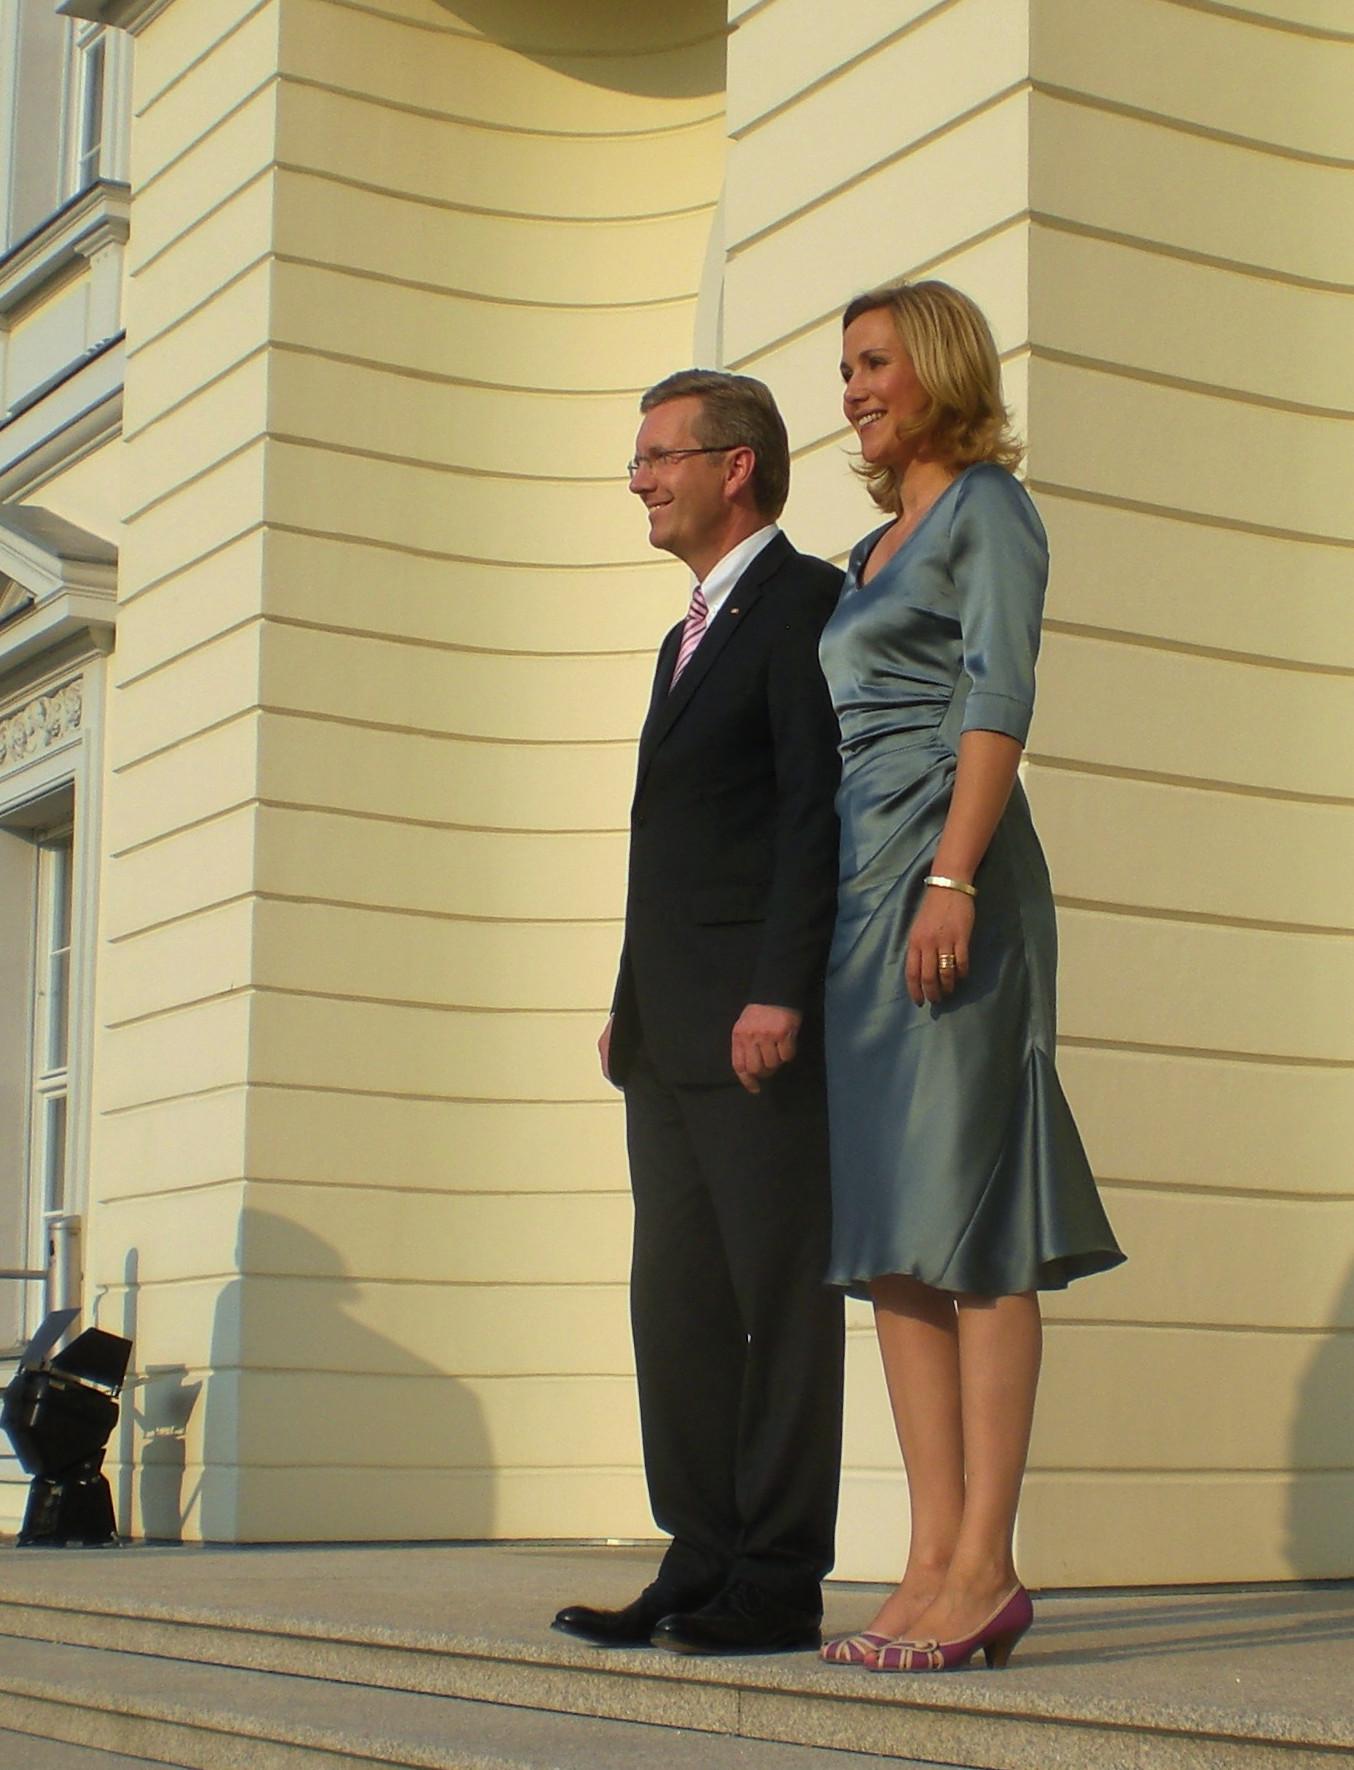 File:Christian und Bettina Wulff.jpg